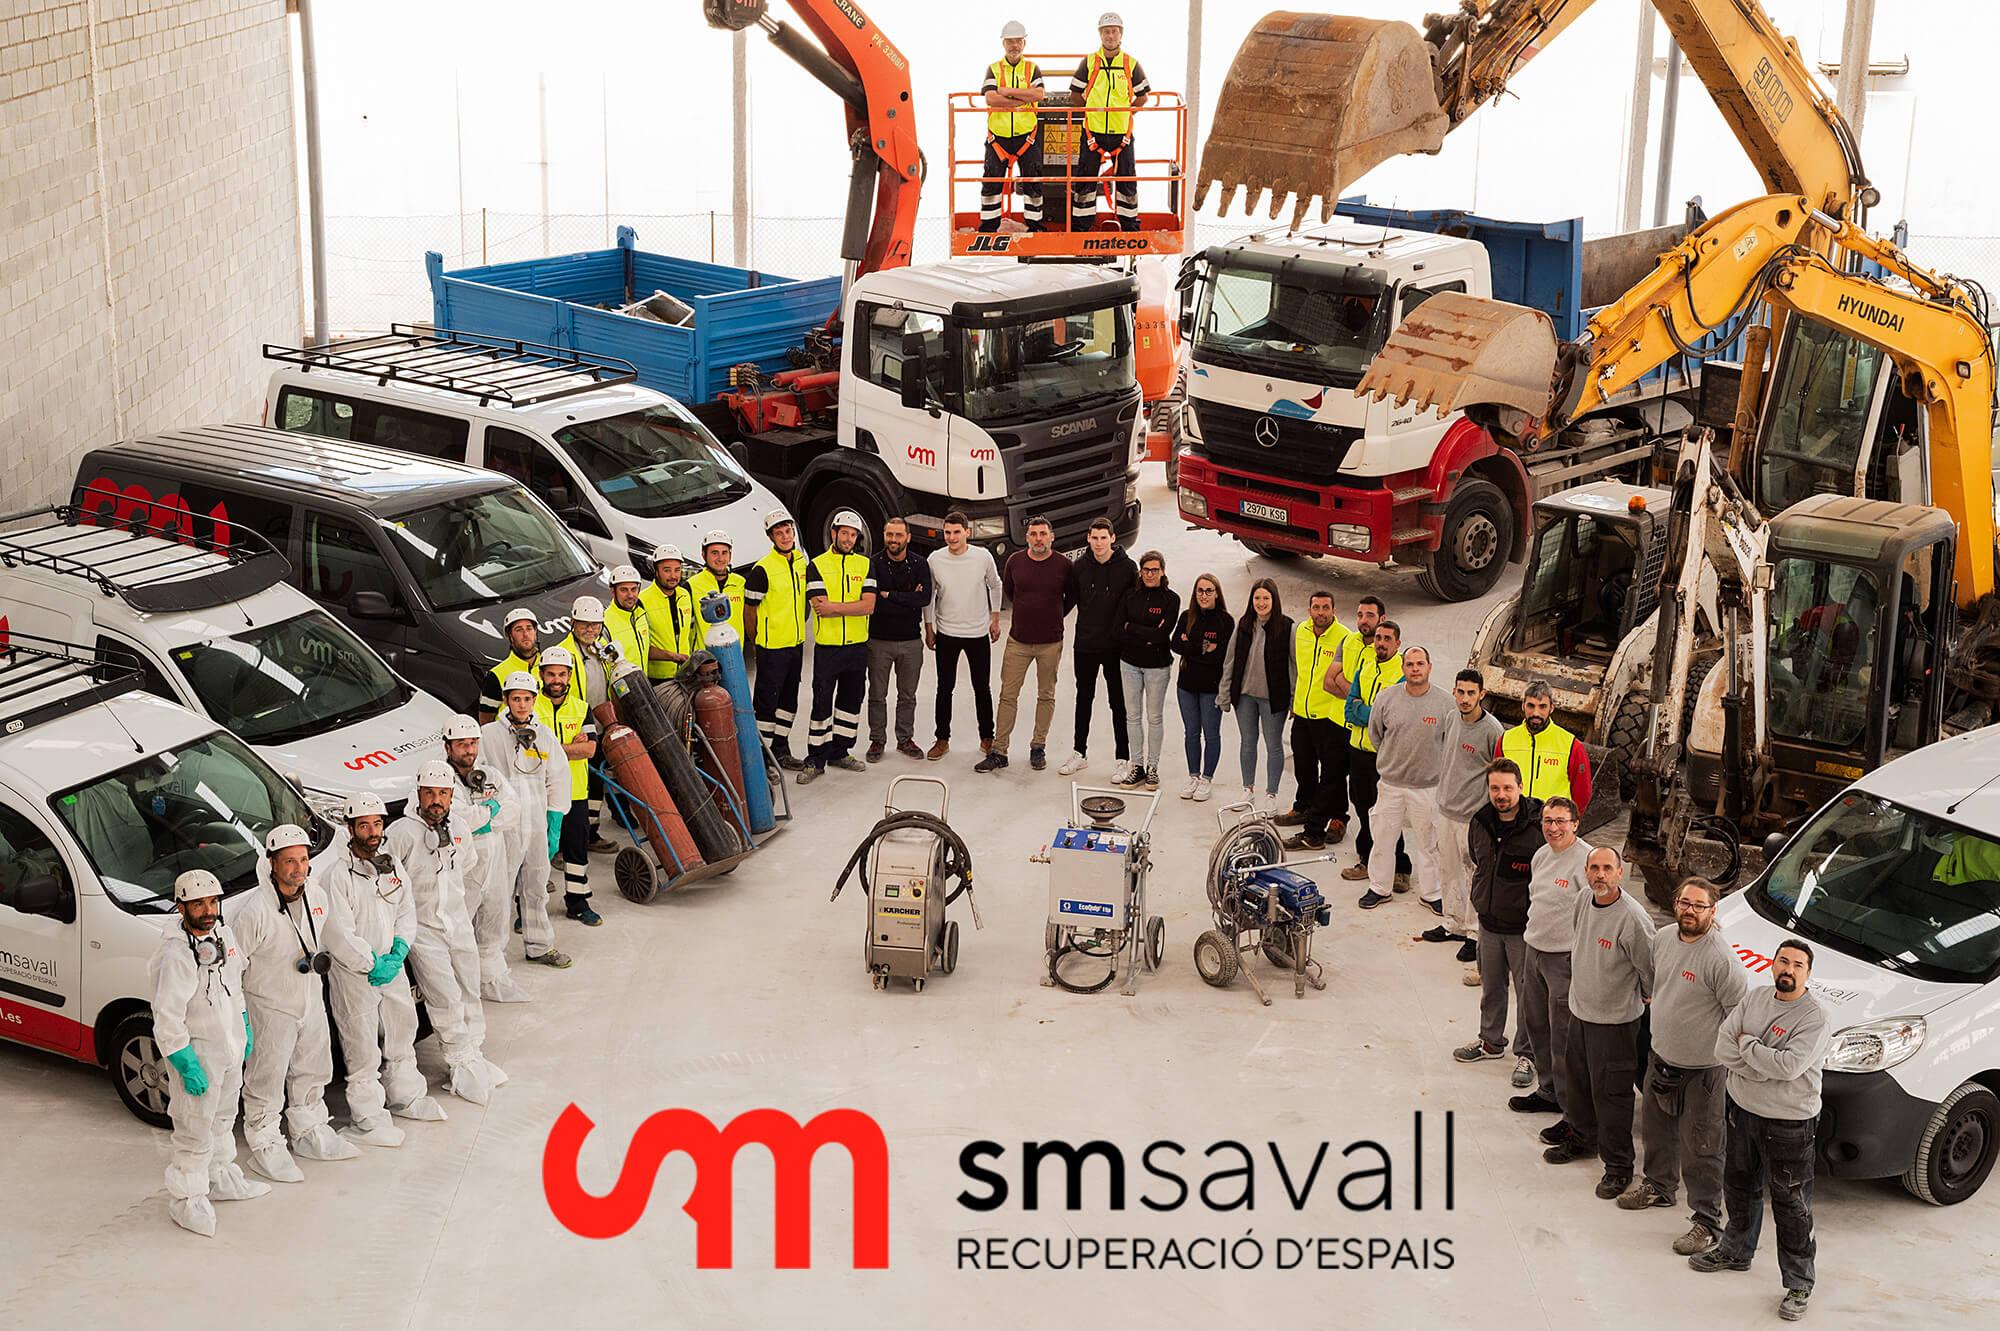 Recuperació d'espais sinistres SM SAVALL